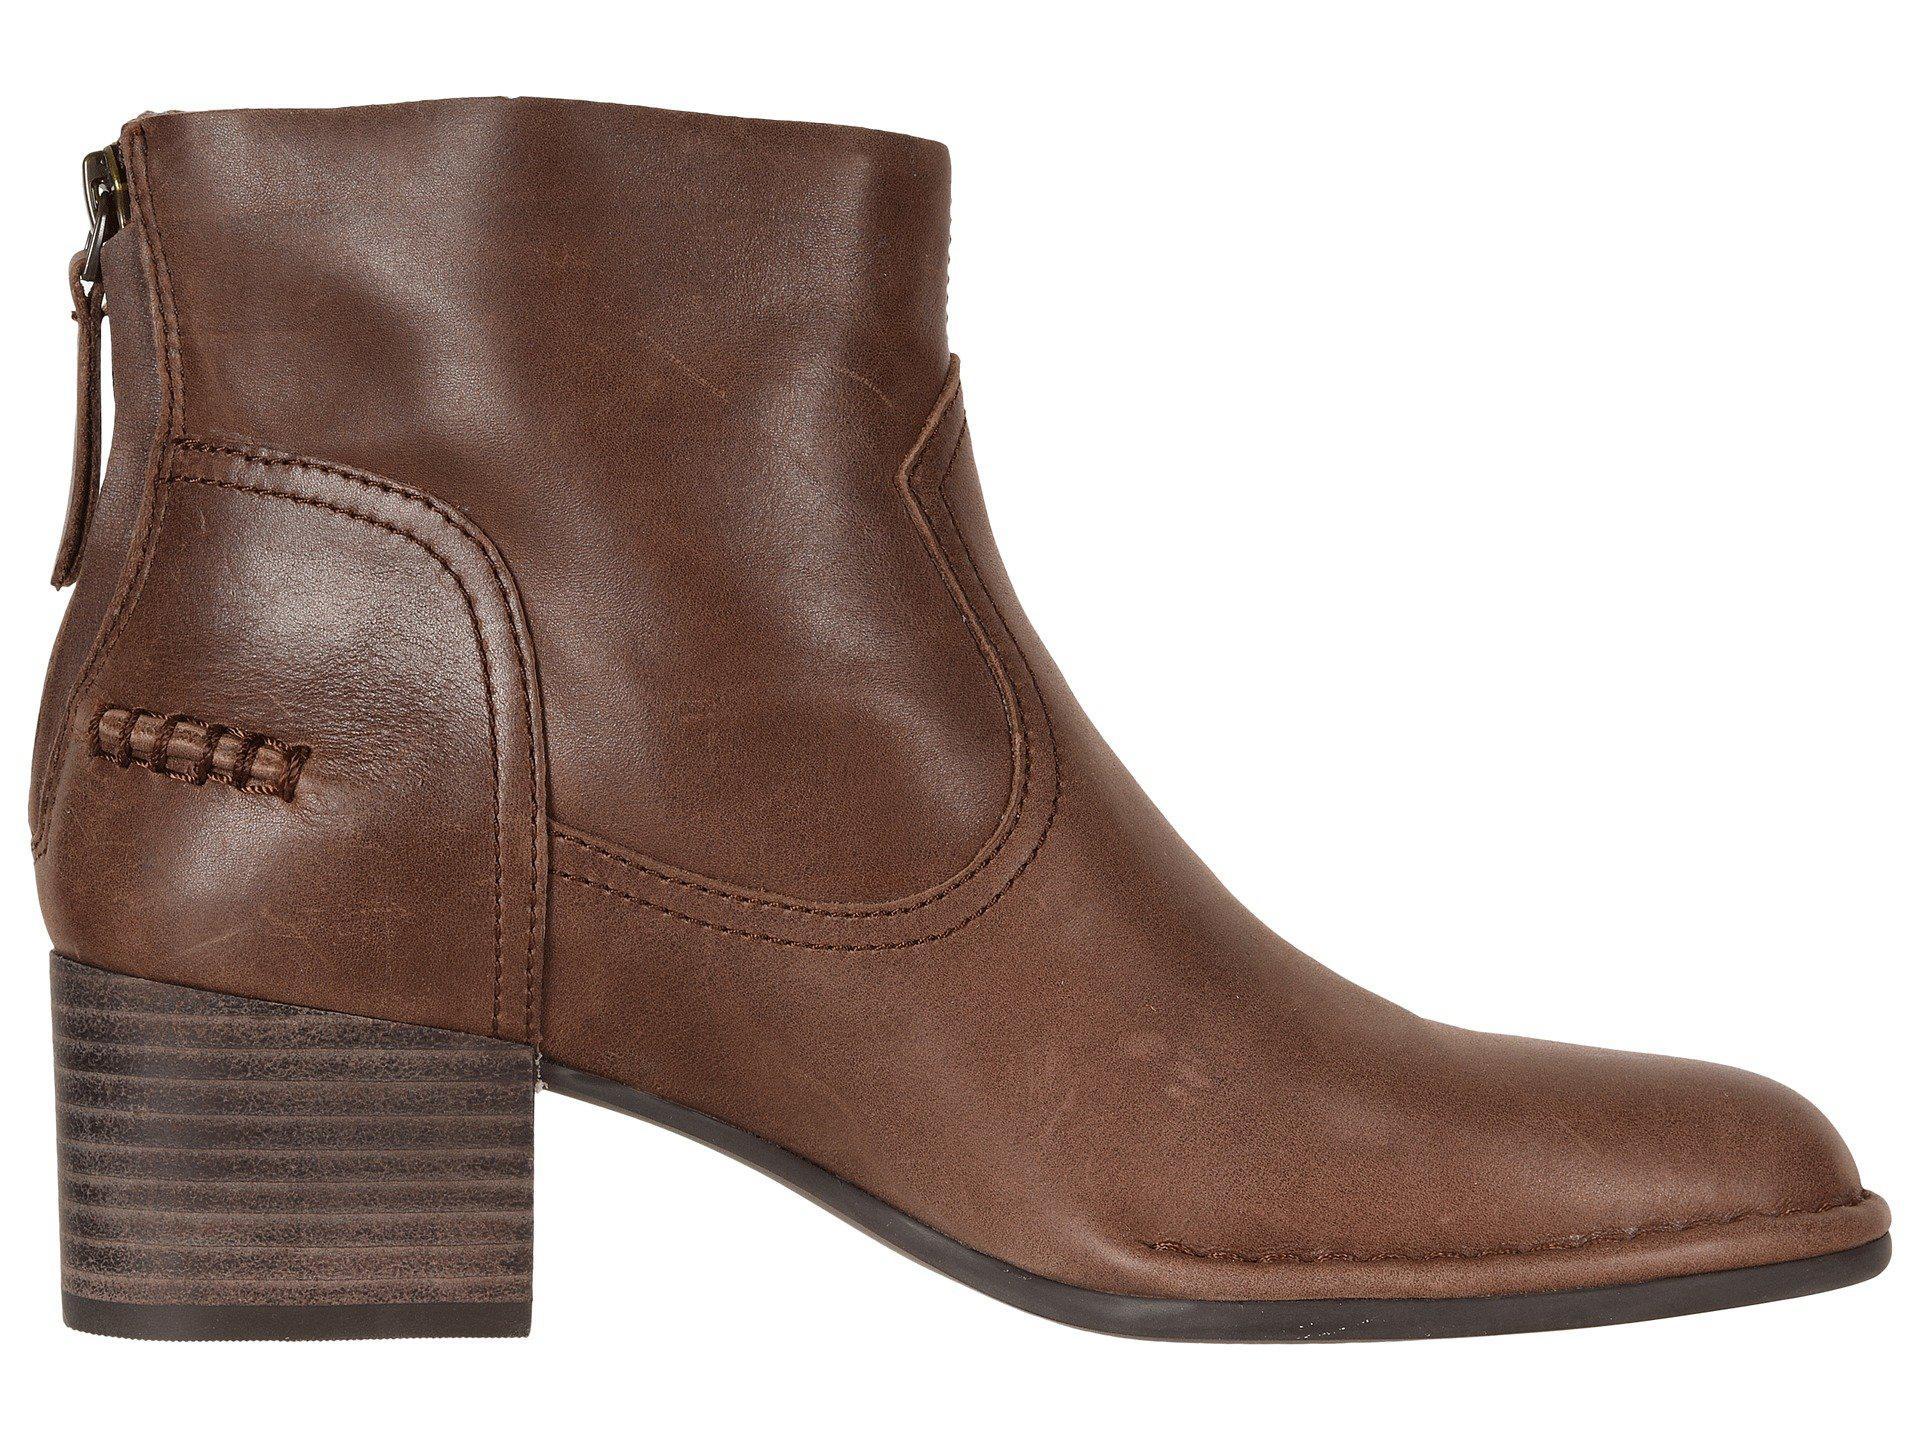 Ugg Bandara Ankle Boot Black Suede Women S Zip Boots In